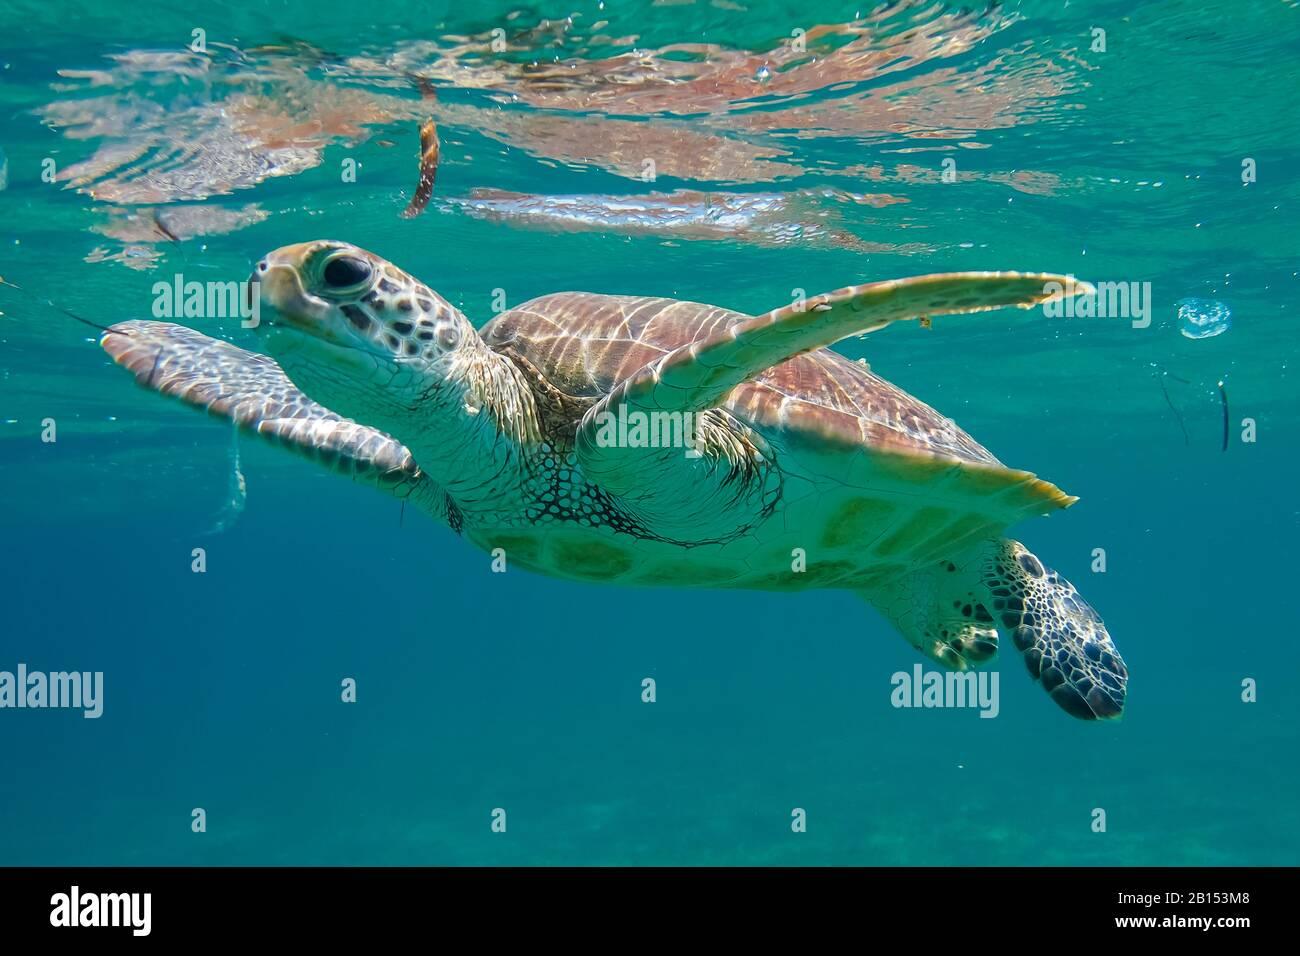 green turtle, rock turtle, meat turtle (Chelonia mydas), swimming in Shaab Abu Dabab bay, Egypt, Red Sea Stock Photo